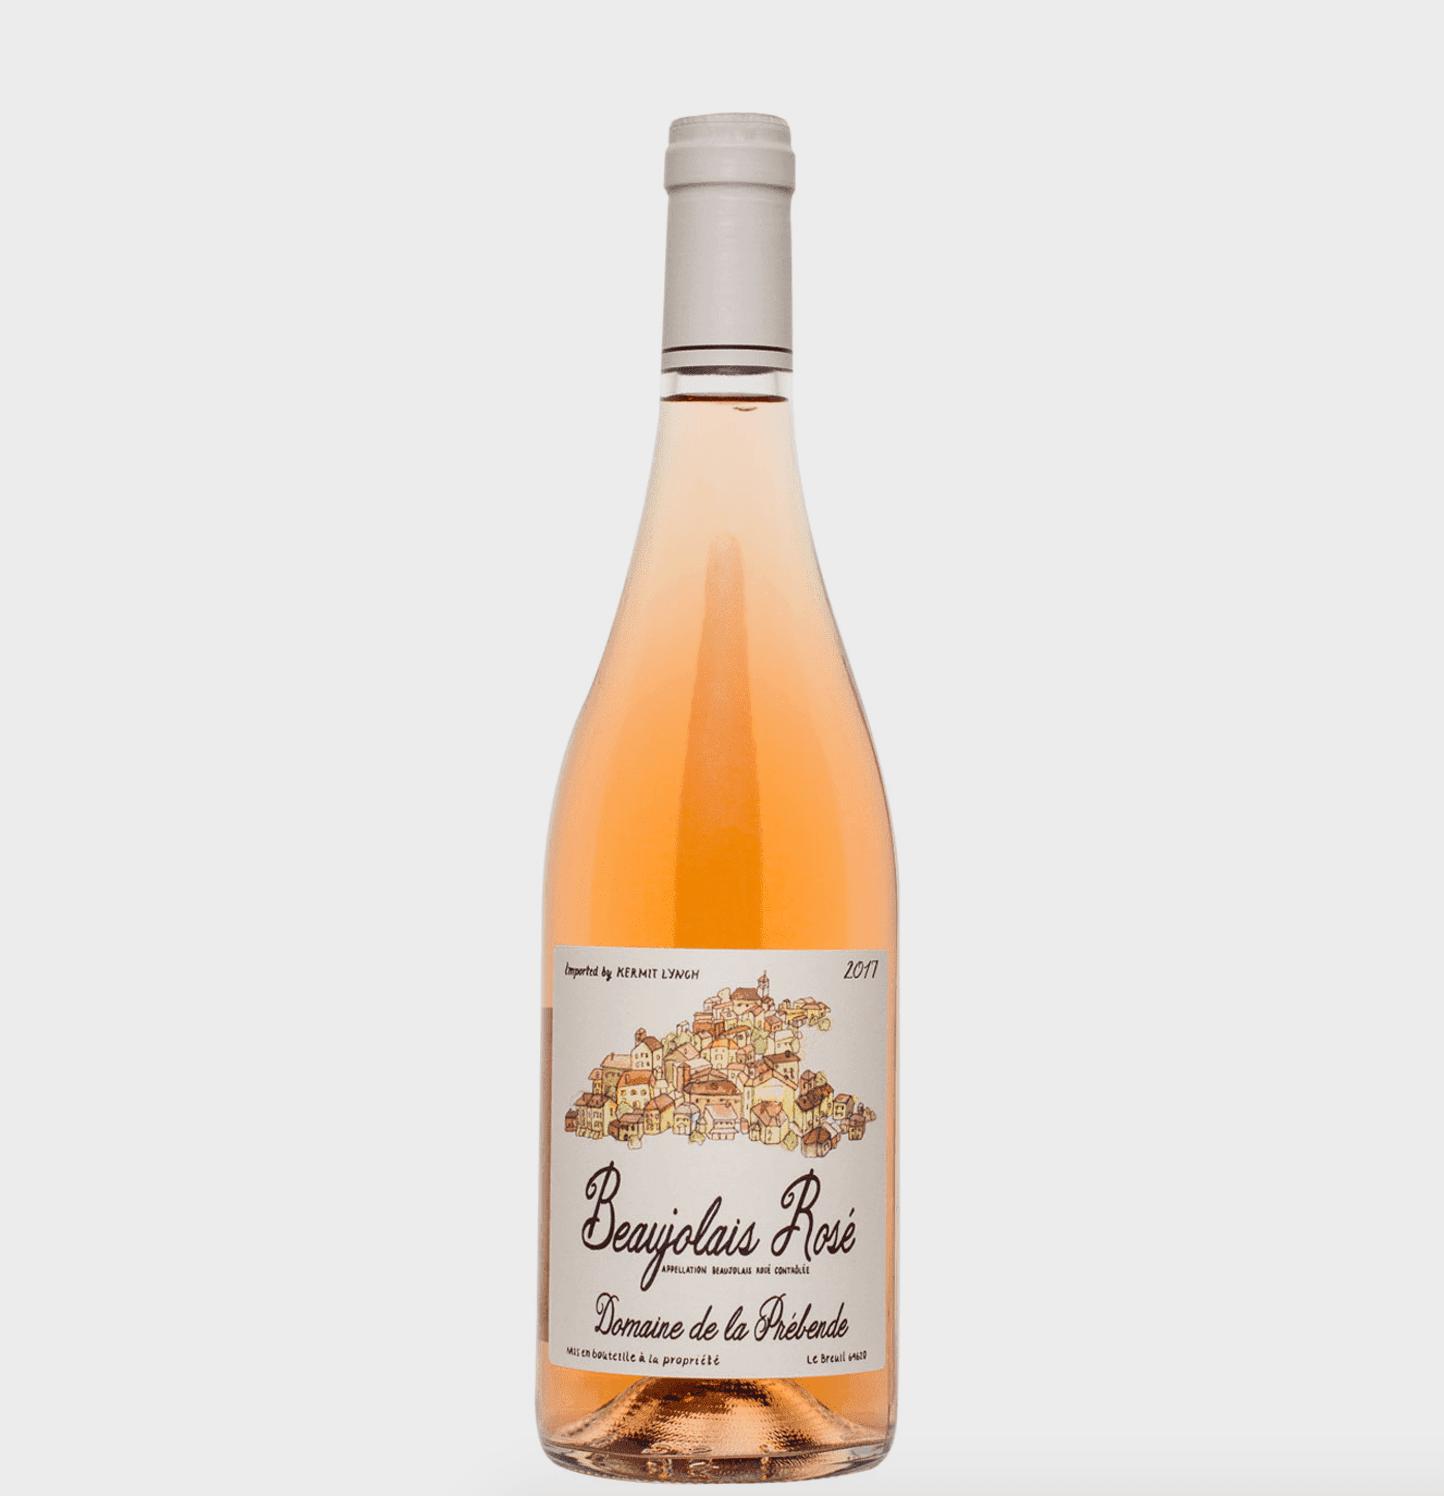 2017 Domaine de la Prebende Beaujolais Rose, Beaujolais